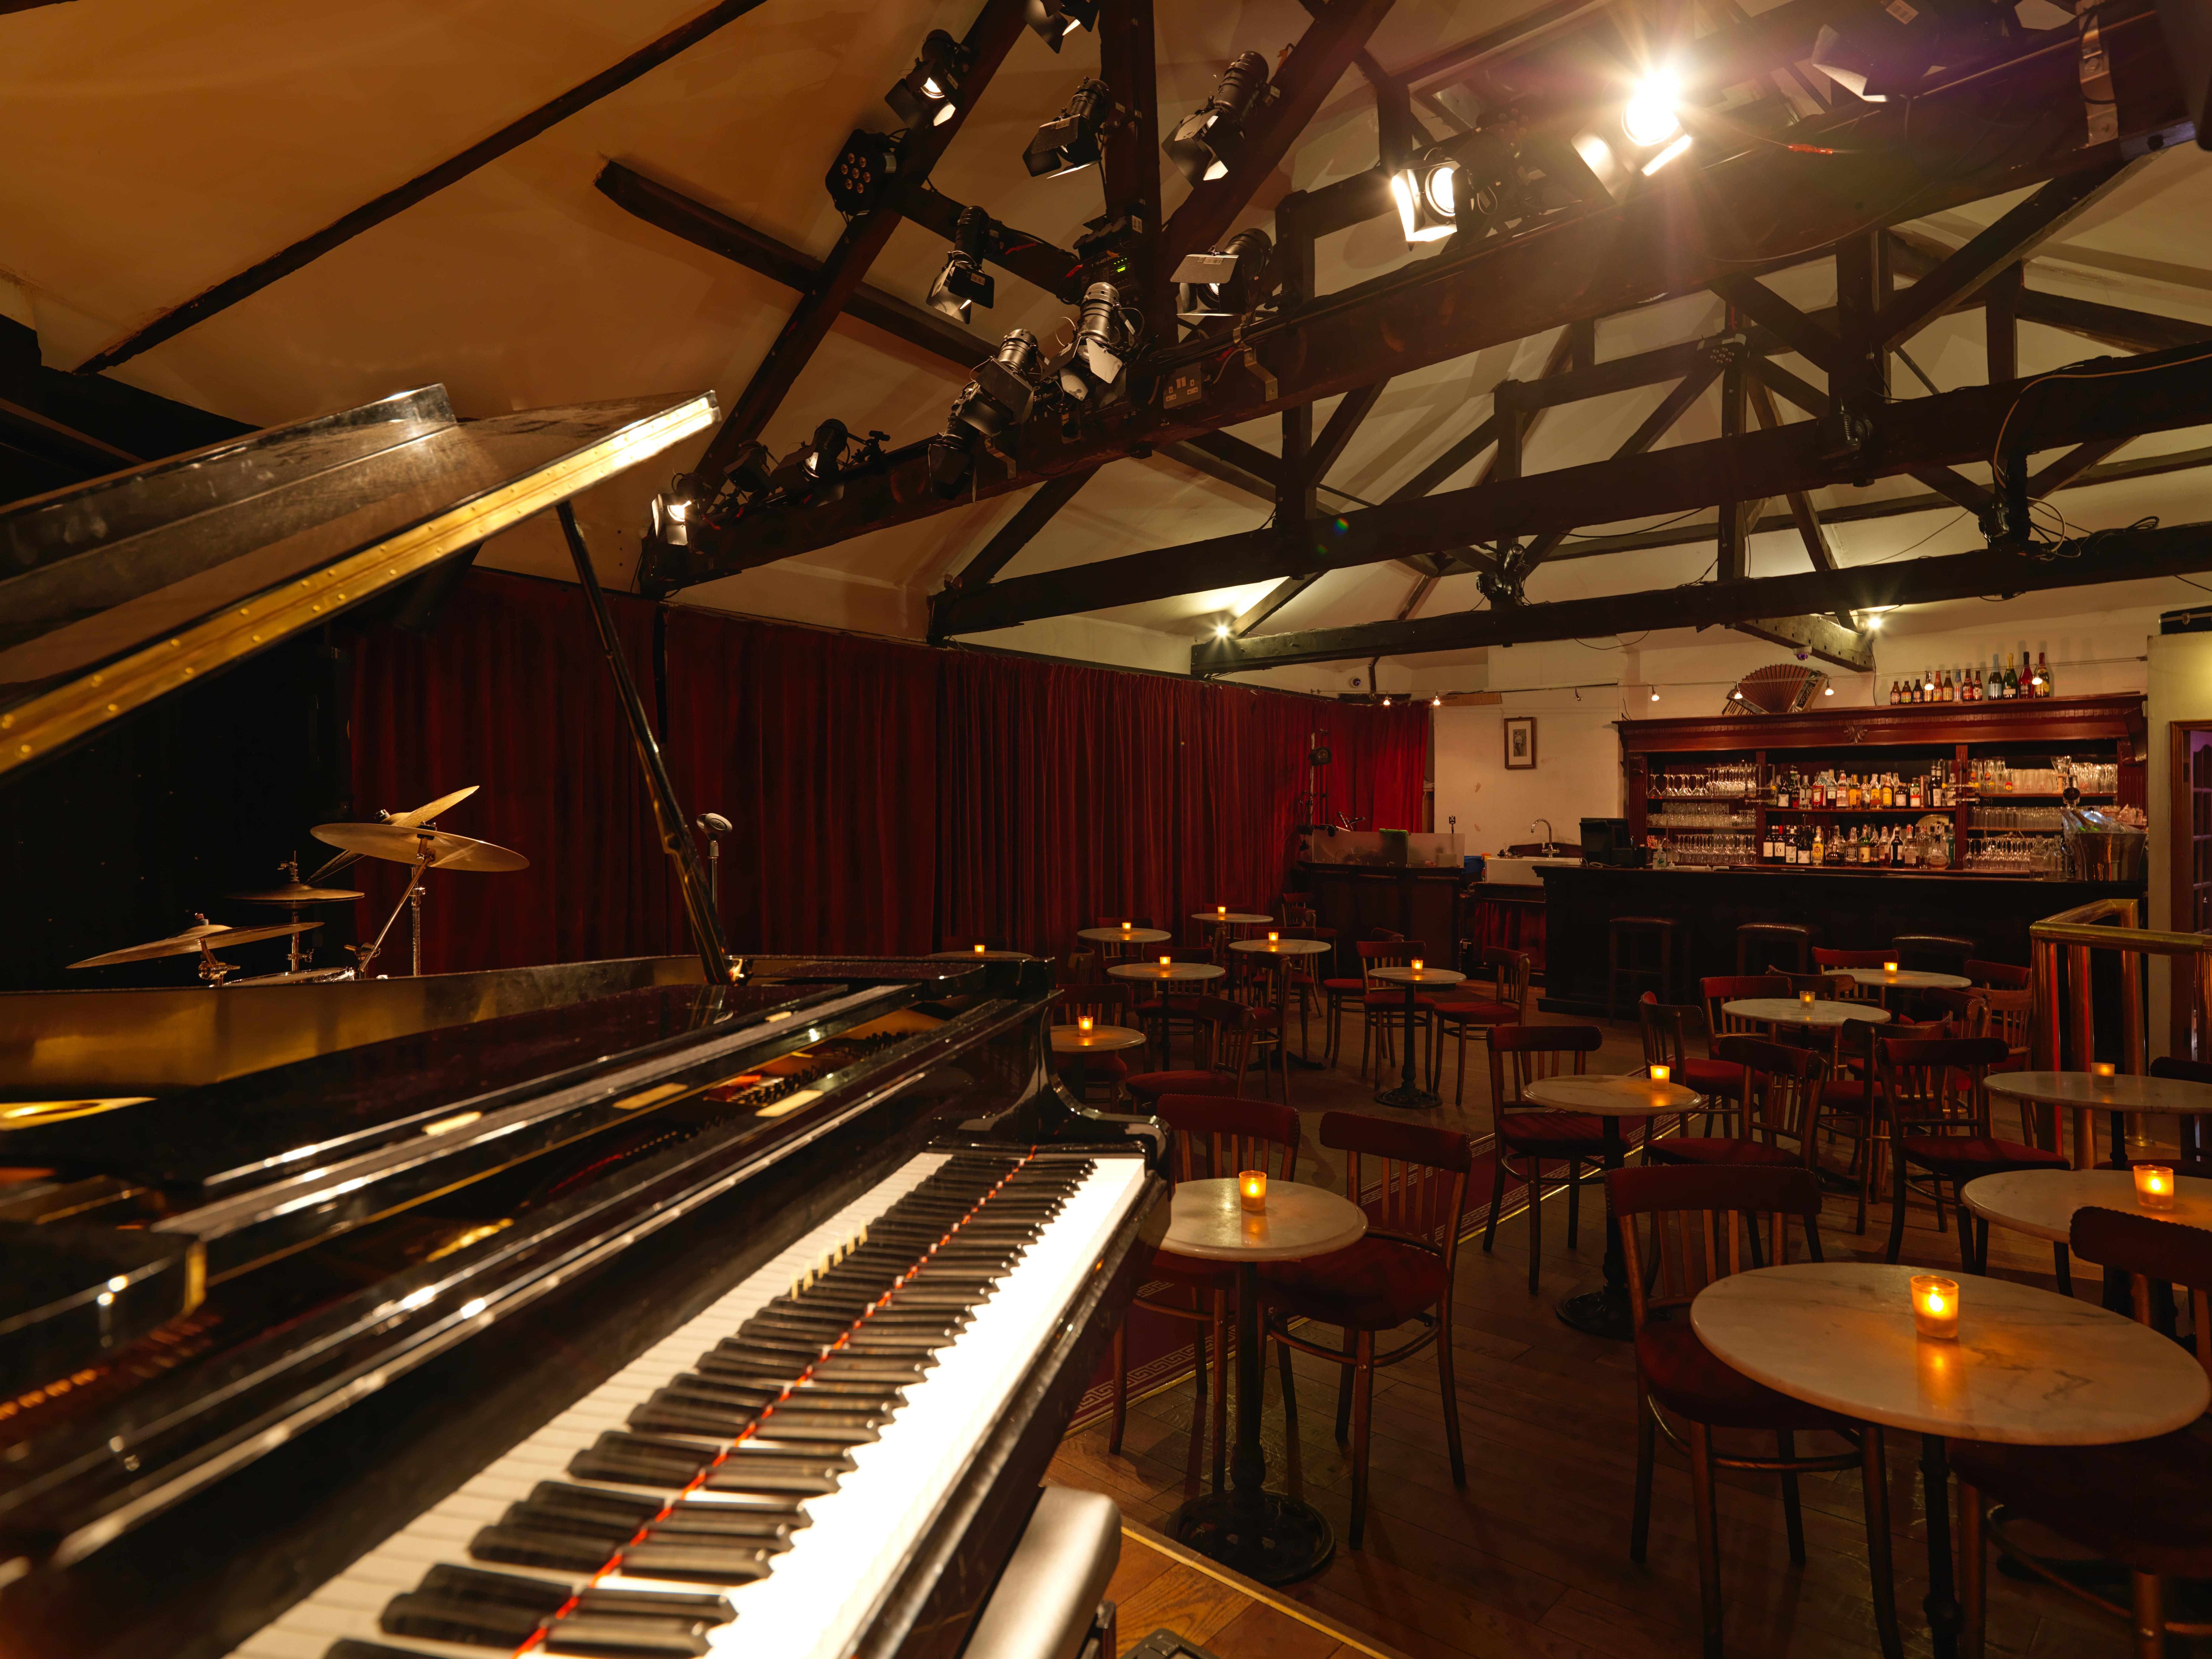 Piano Practice Rooms